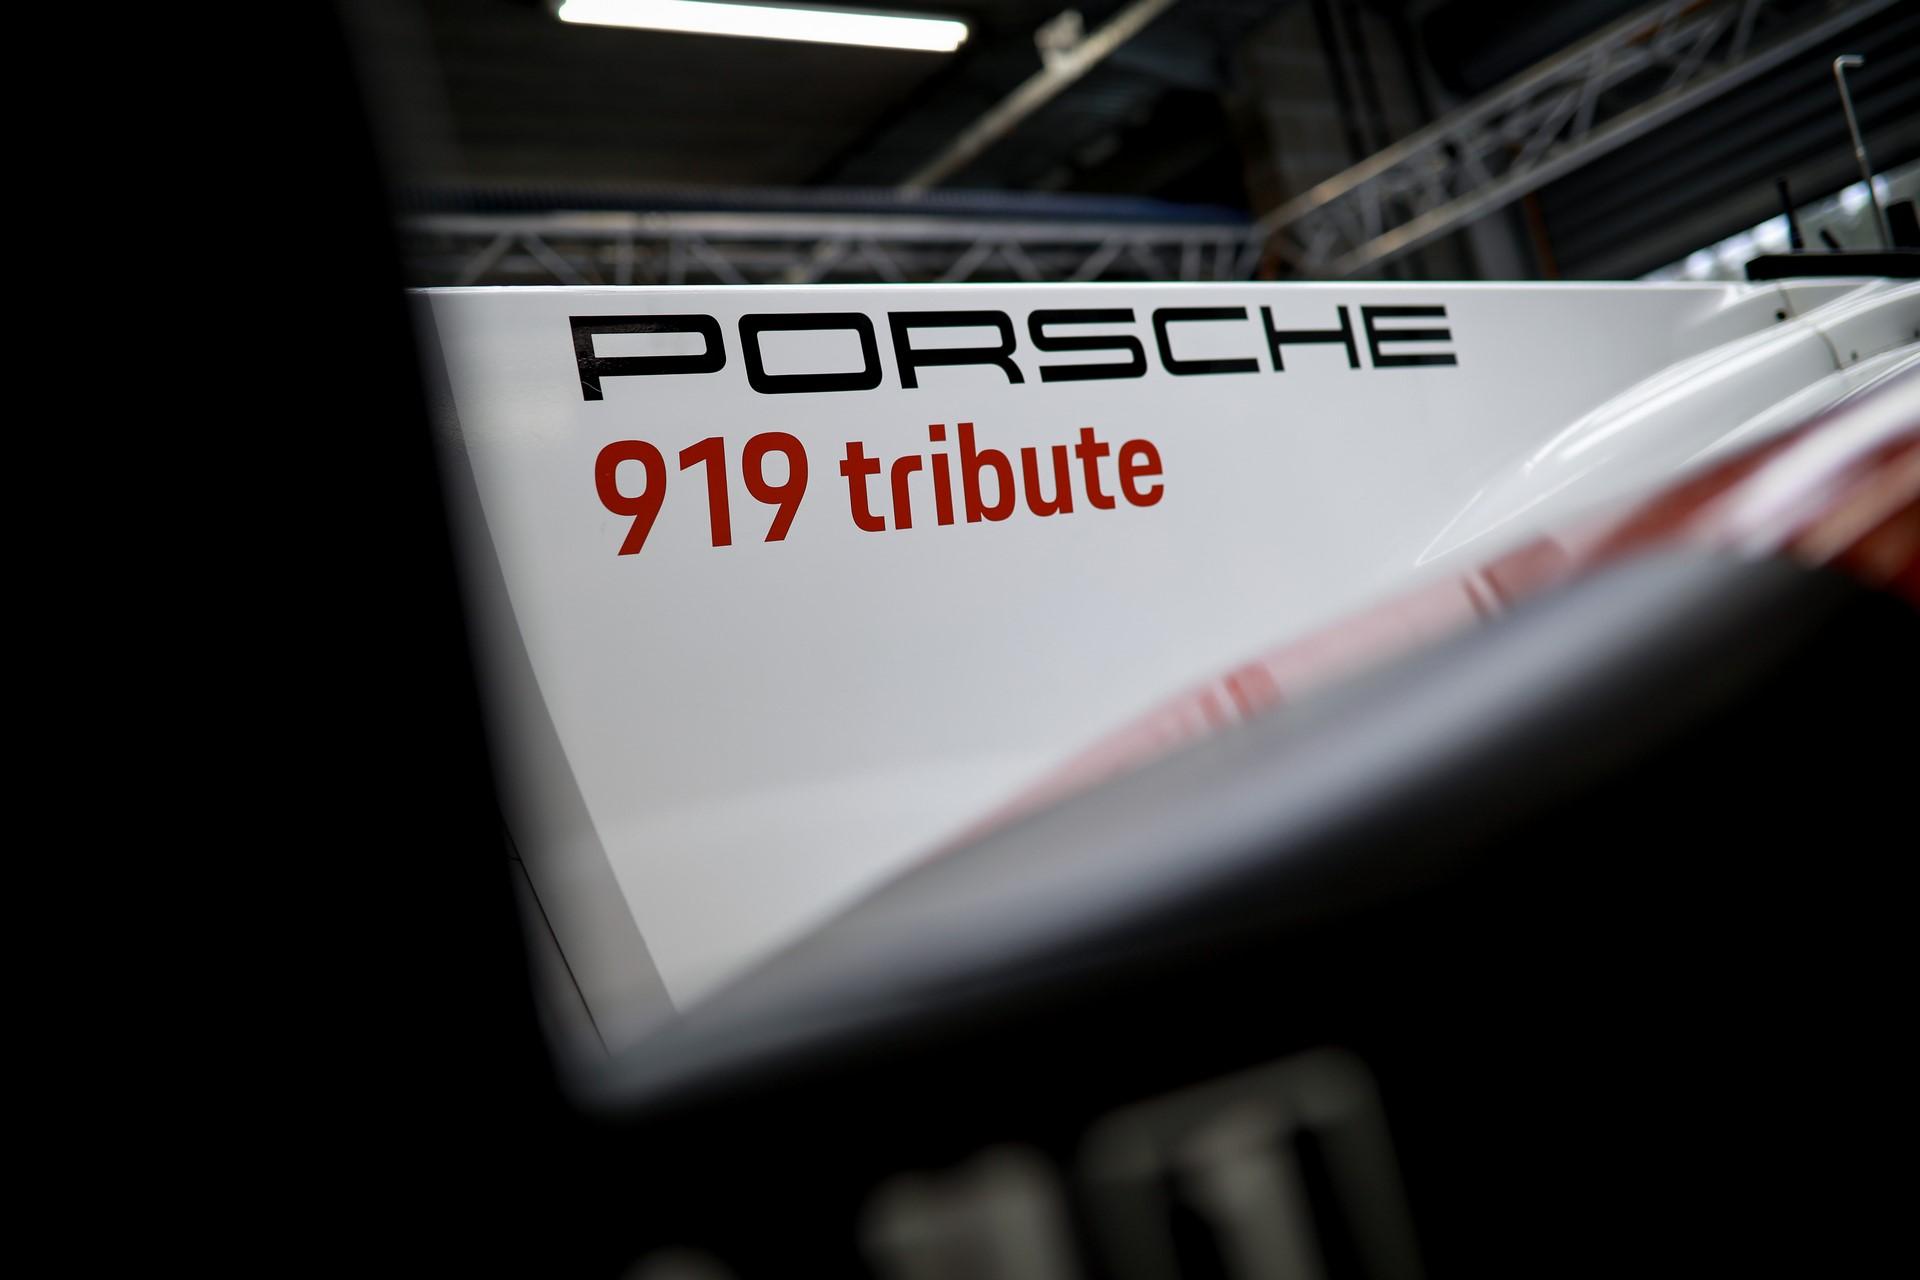 Porsche 919 Hybrid Evo Spa Record (30)